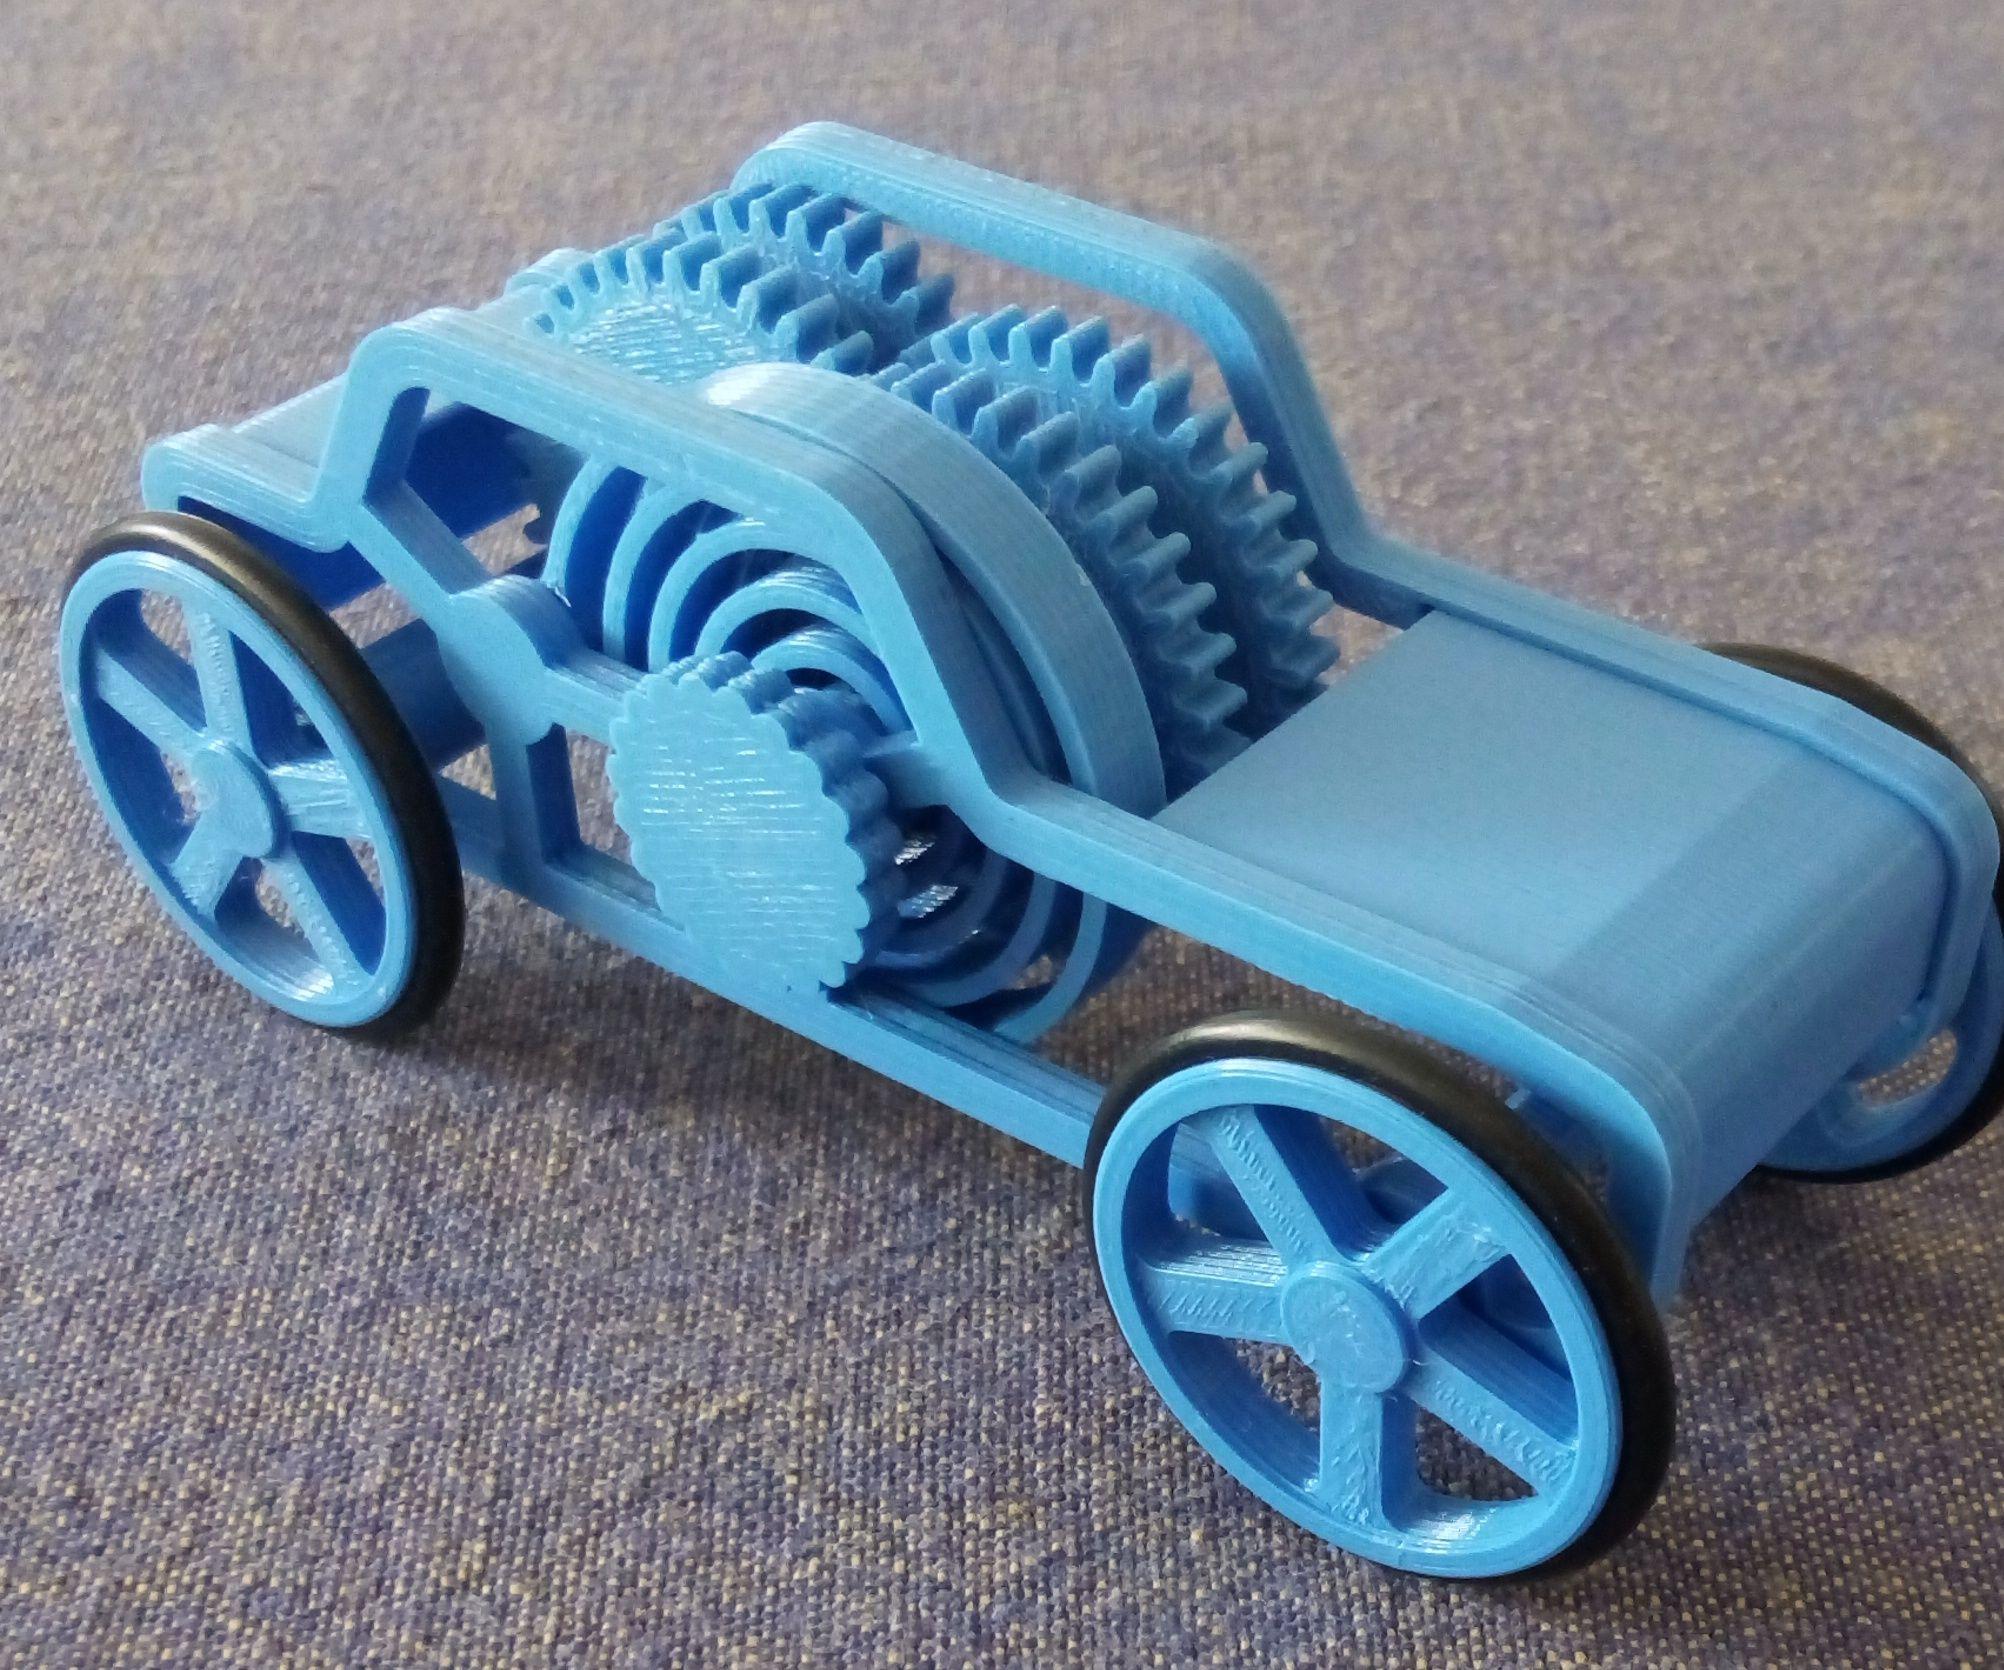 3D printed Car toy windup motor